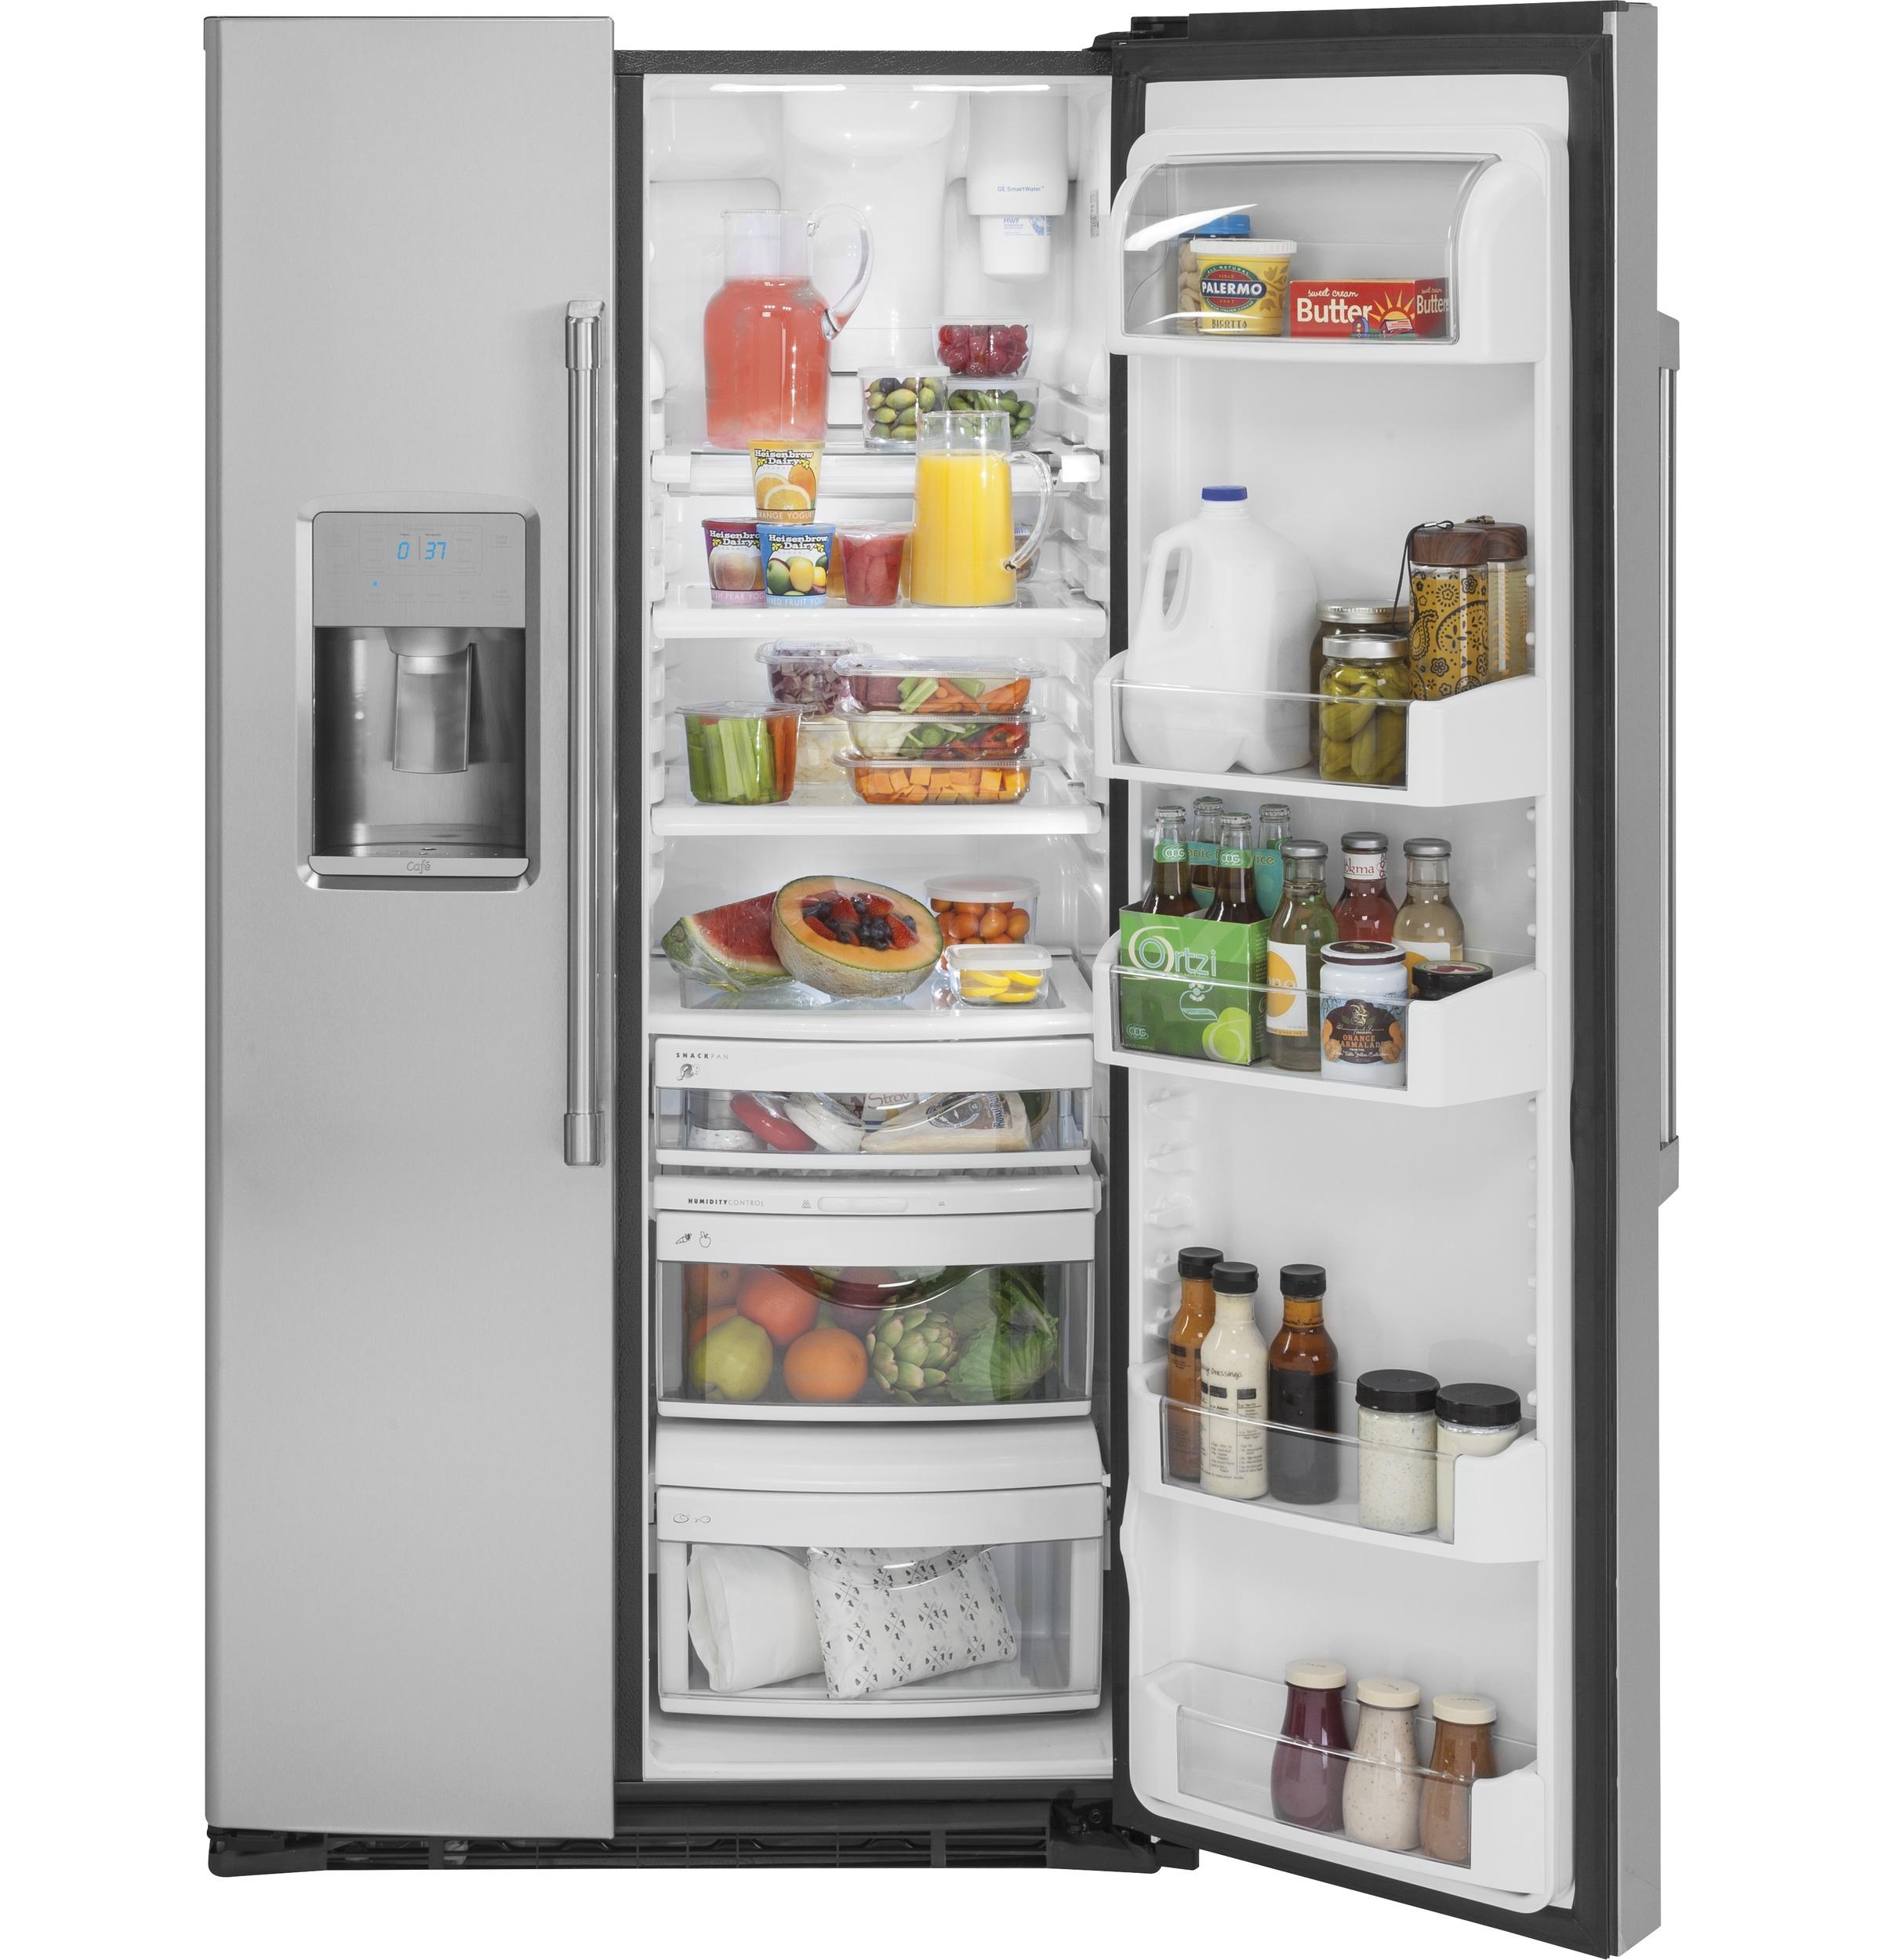 Model: CZS22MSKSS | GE Café™ Series  21.9 Cu. Ft. Counter-Depth Side-By-Side Refrigerator